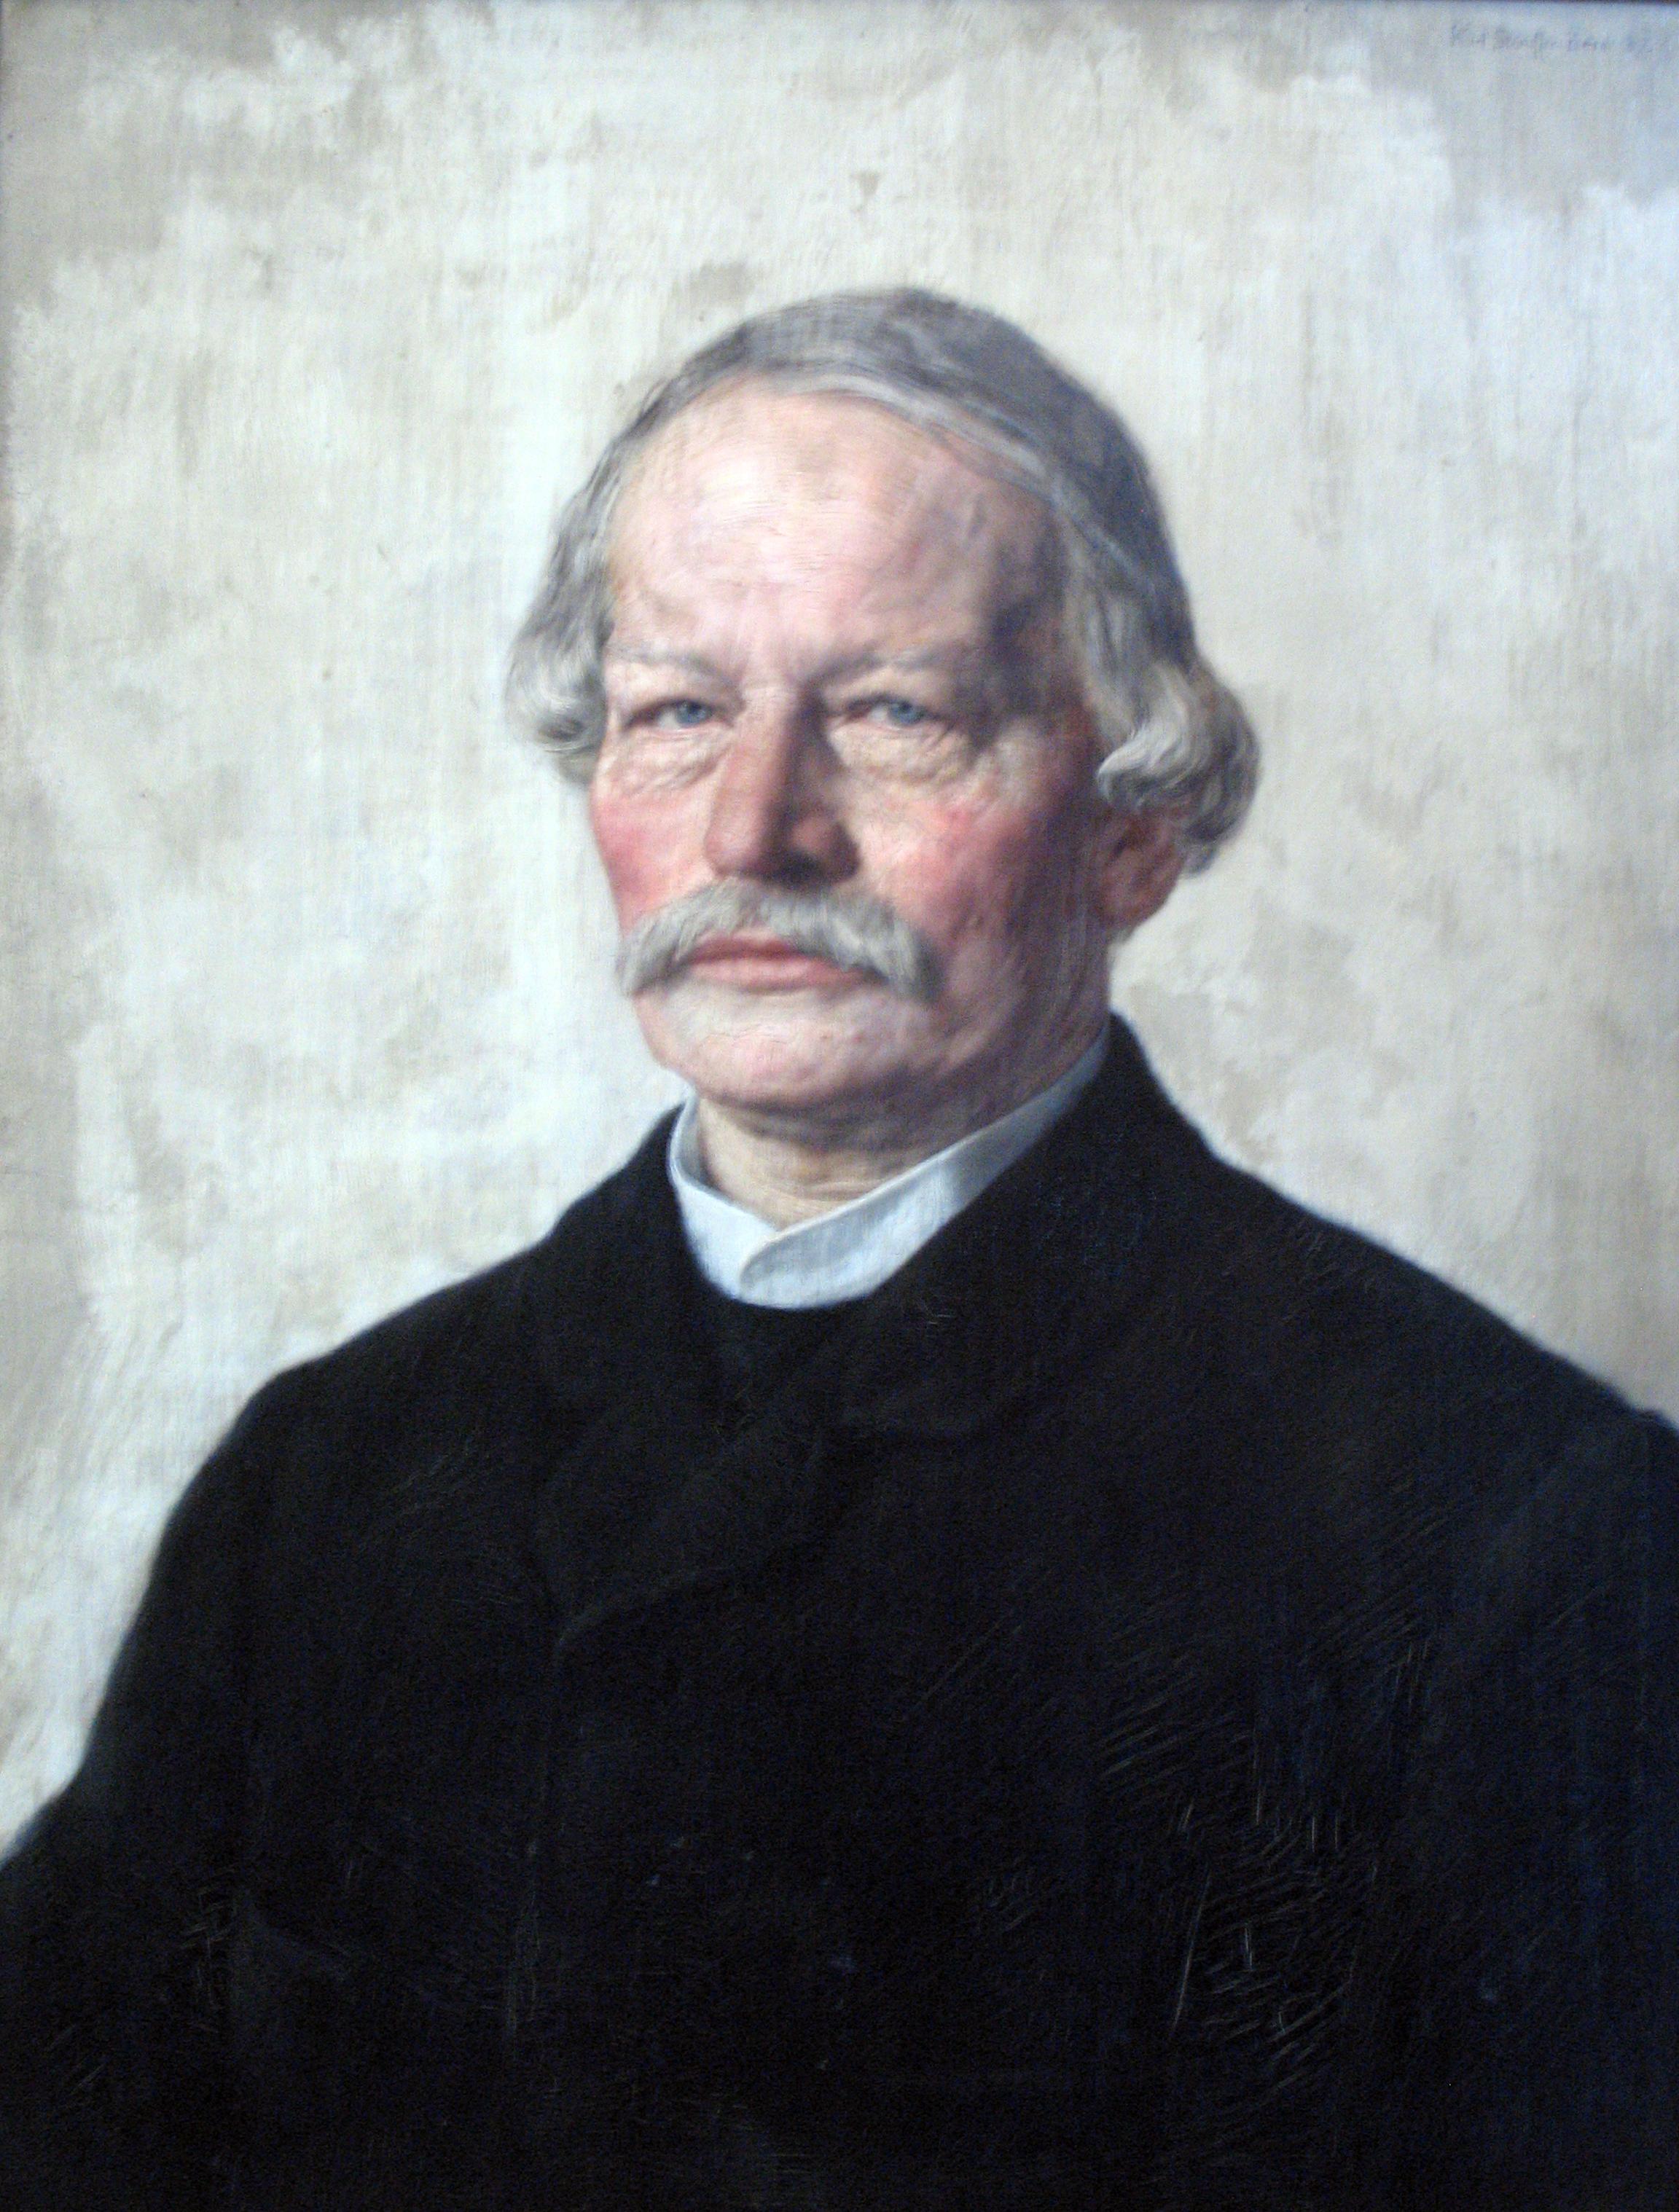 File:1886 Stauffer-Bern Gustav Freytag anagoria.JPG - Wikimedia ...